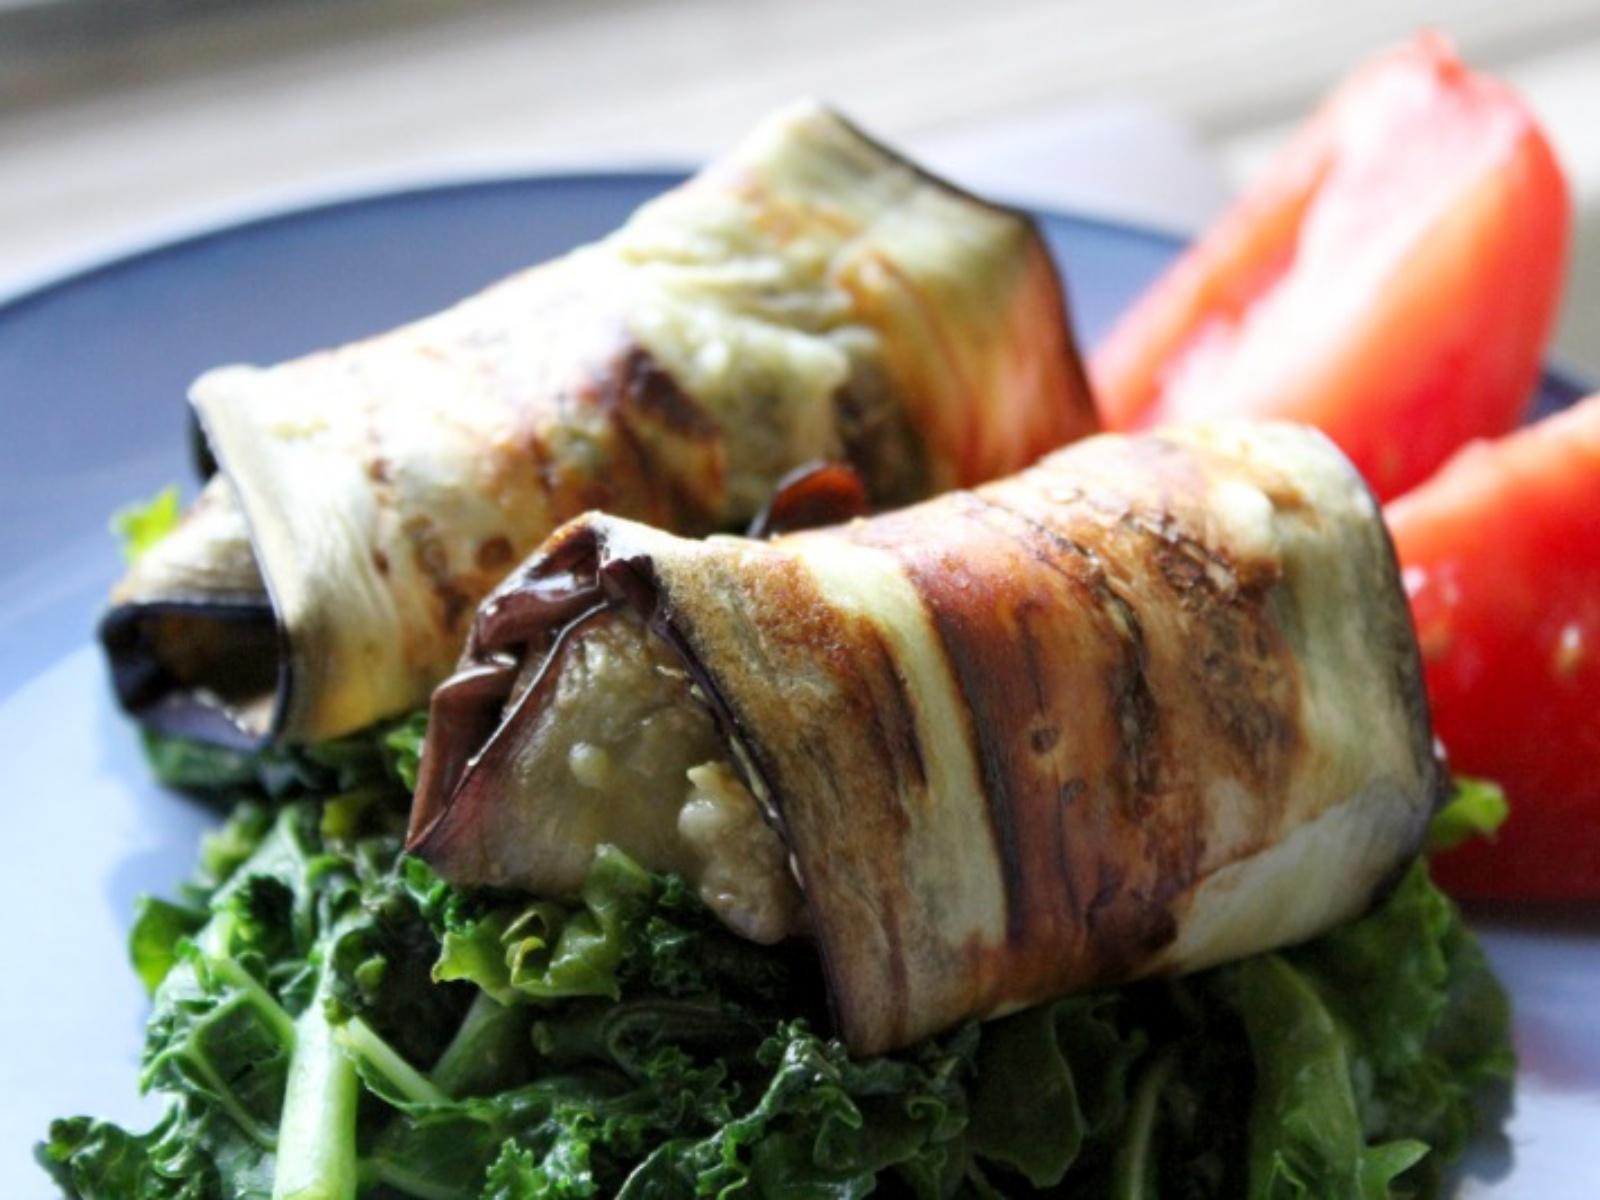 Vegan Eggplant Roll Ups with Hemp Basil Pesto